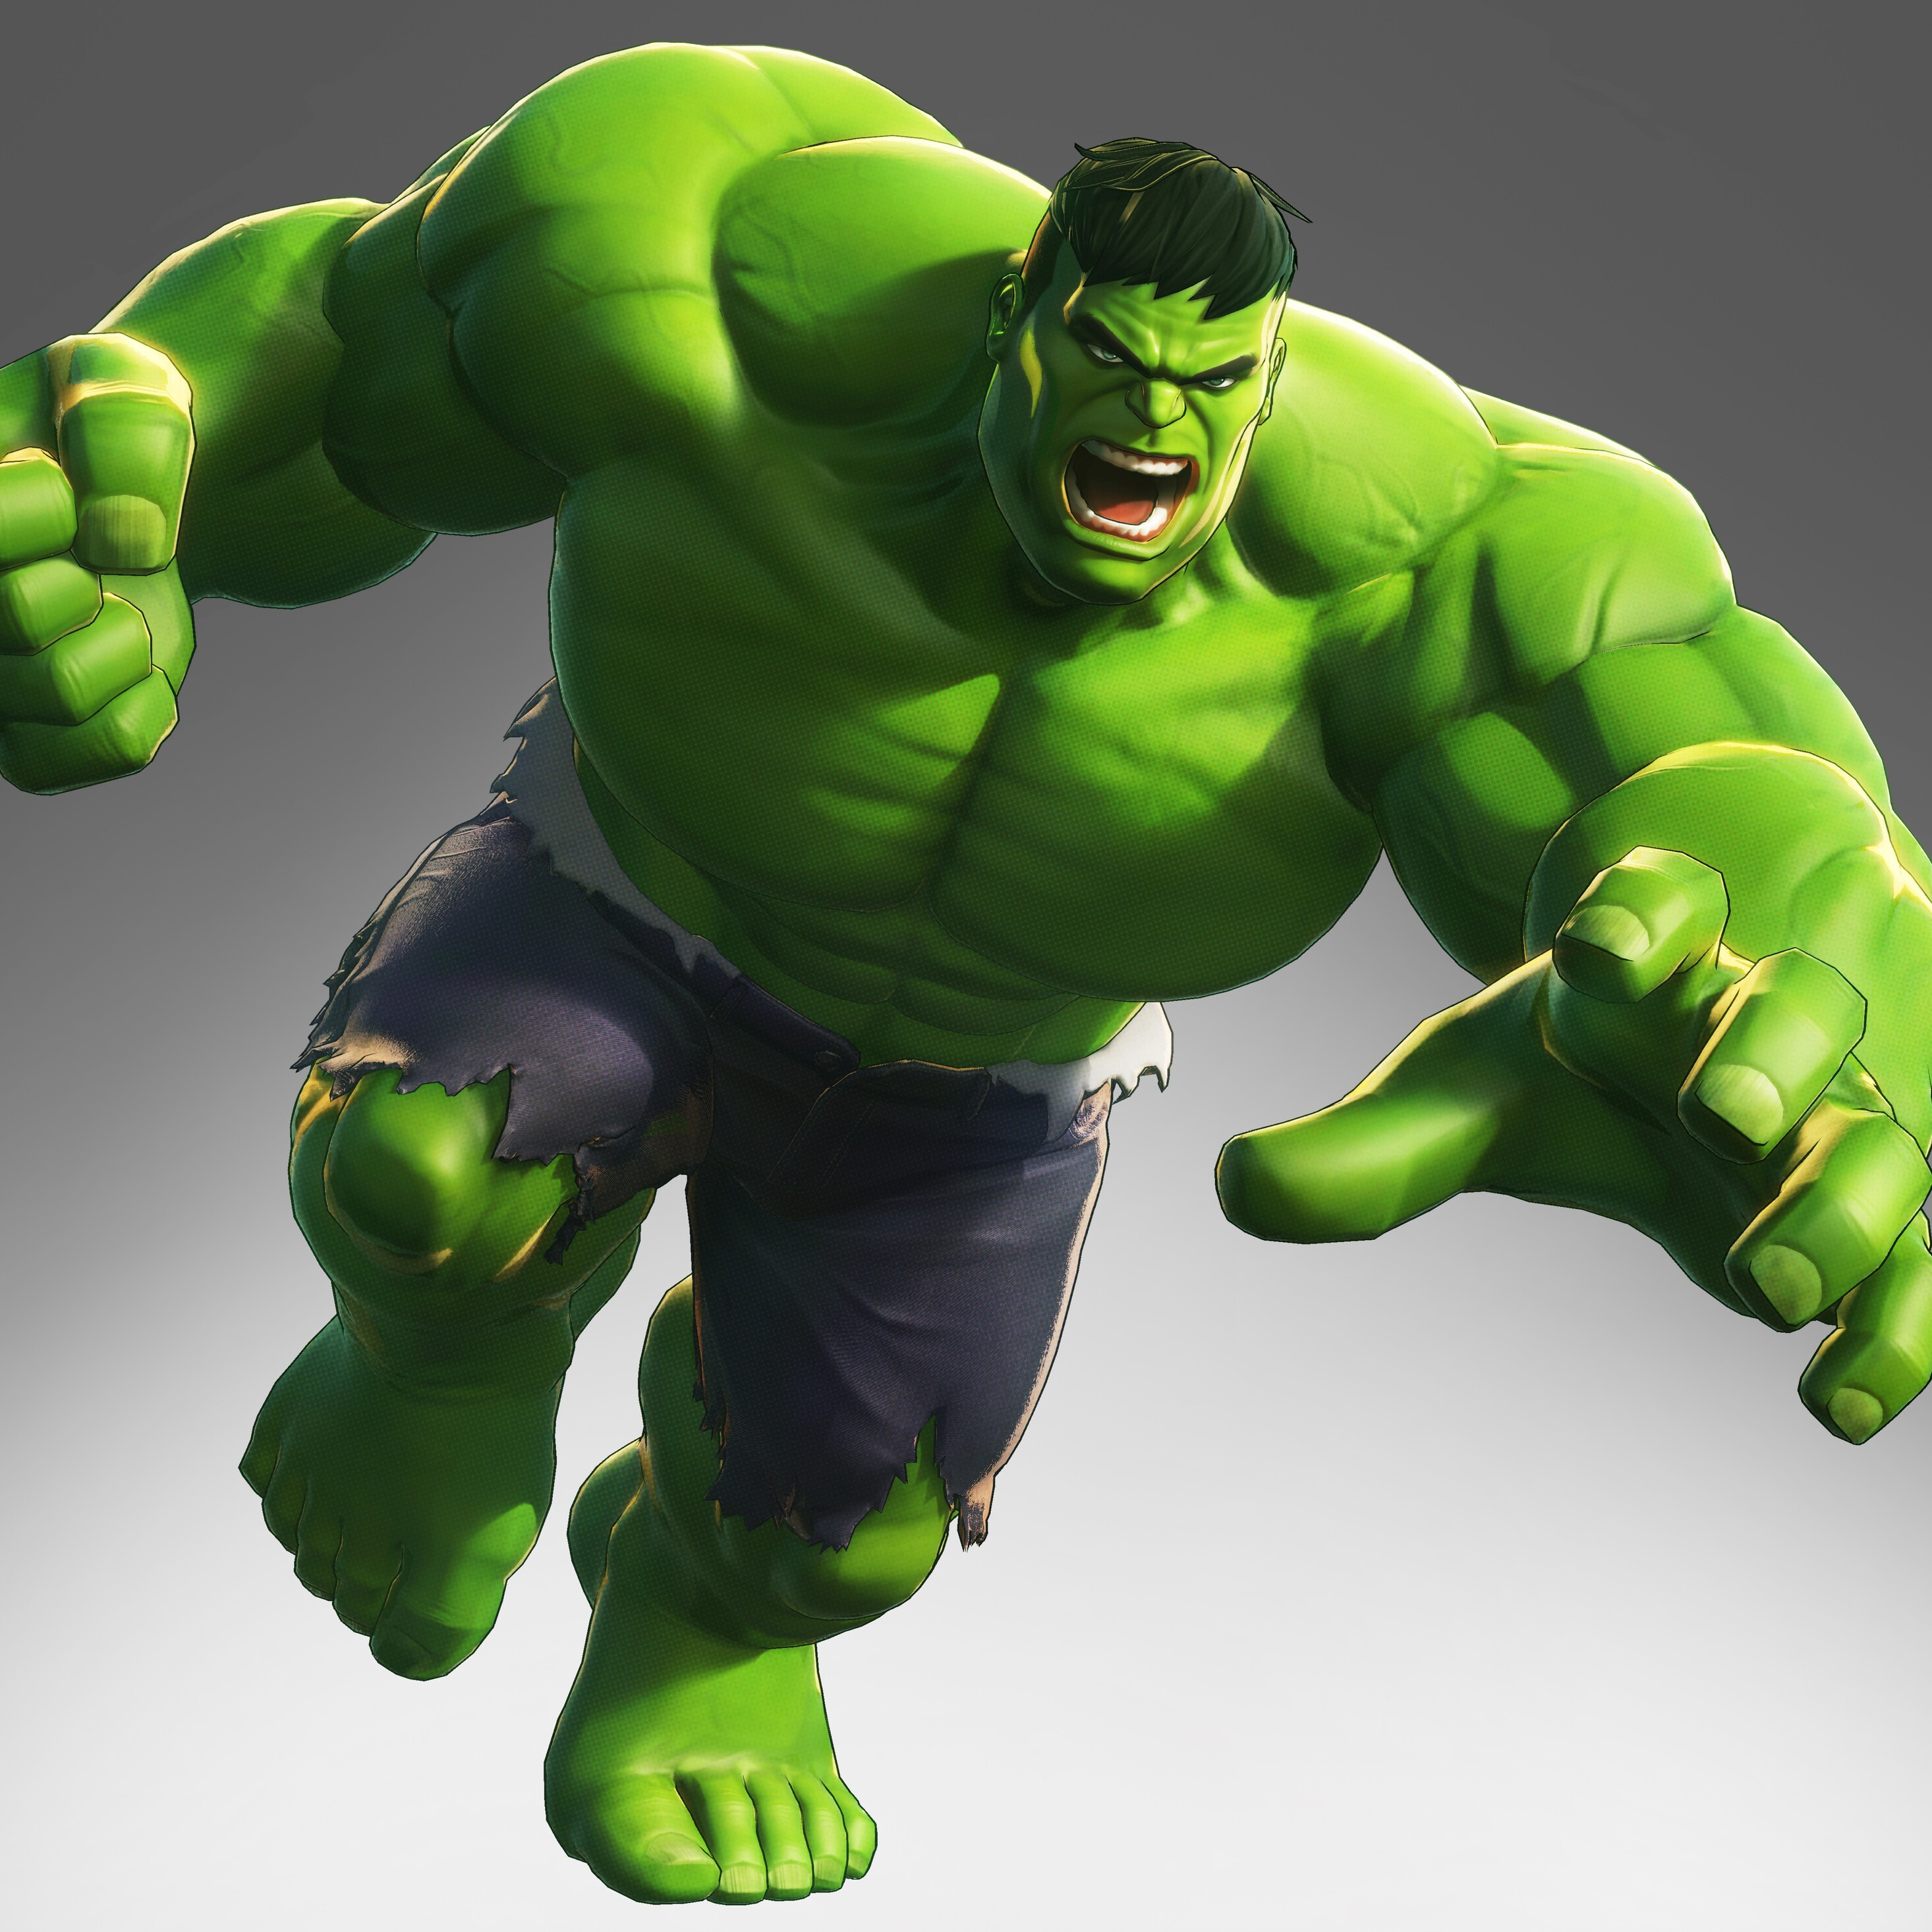 marvel-ultimate-alliance-3-2019-hulk-s8.jpg